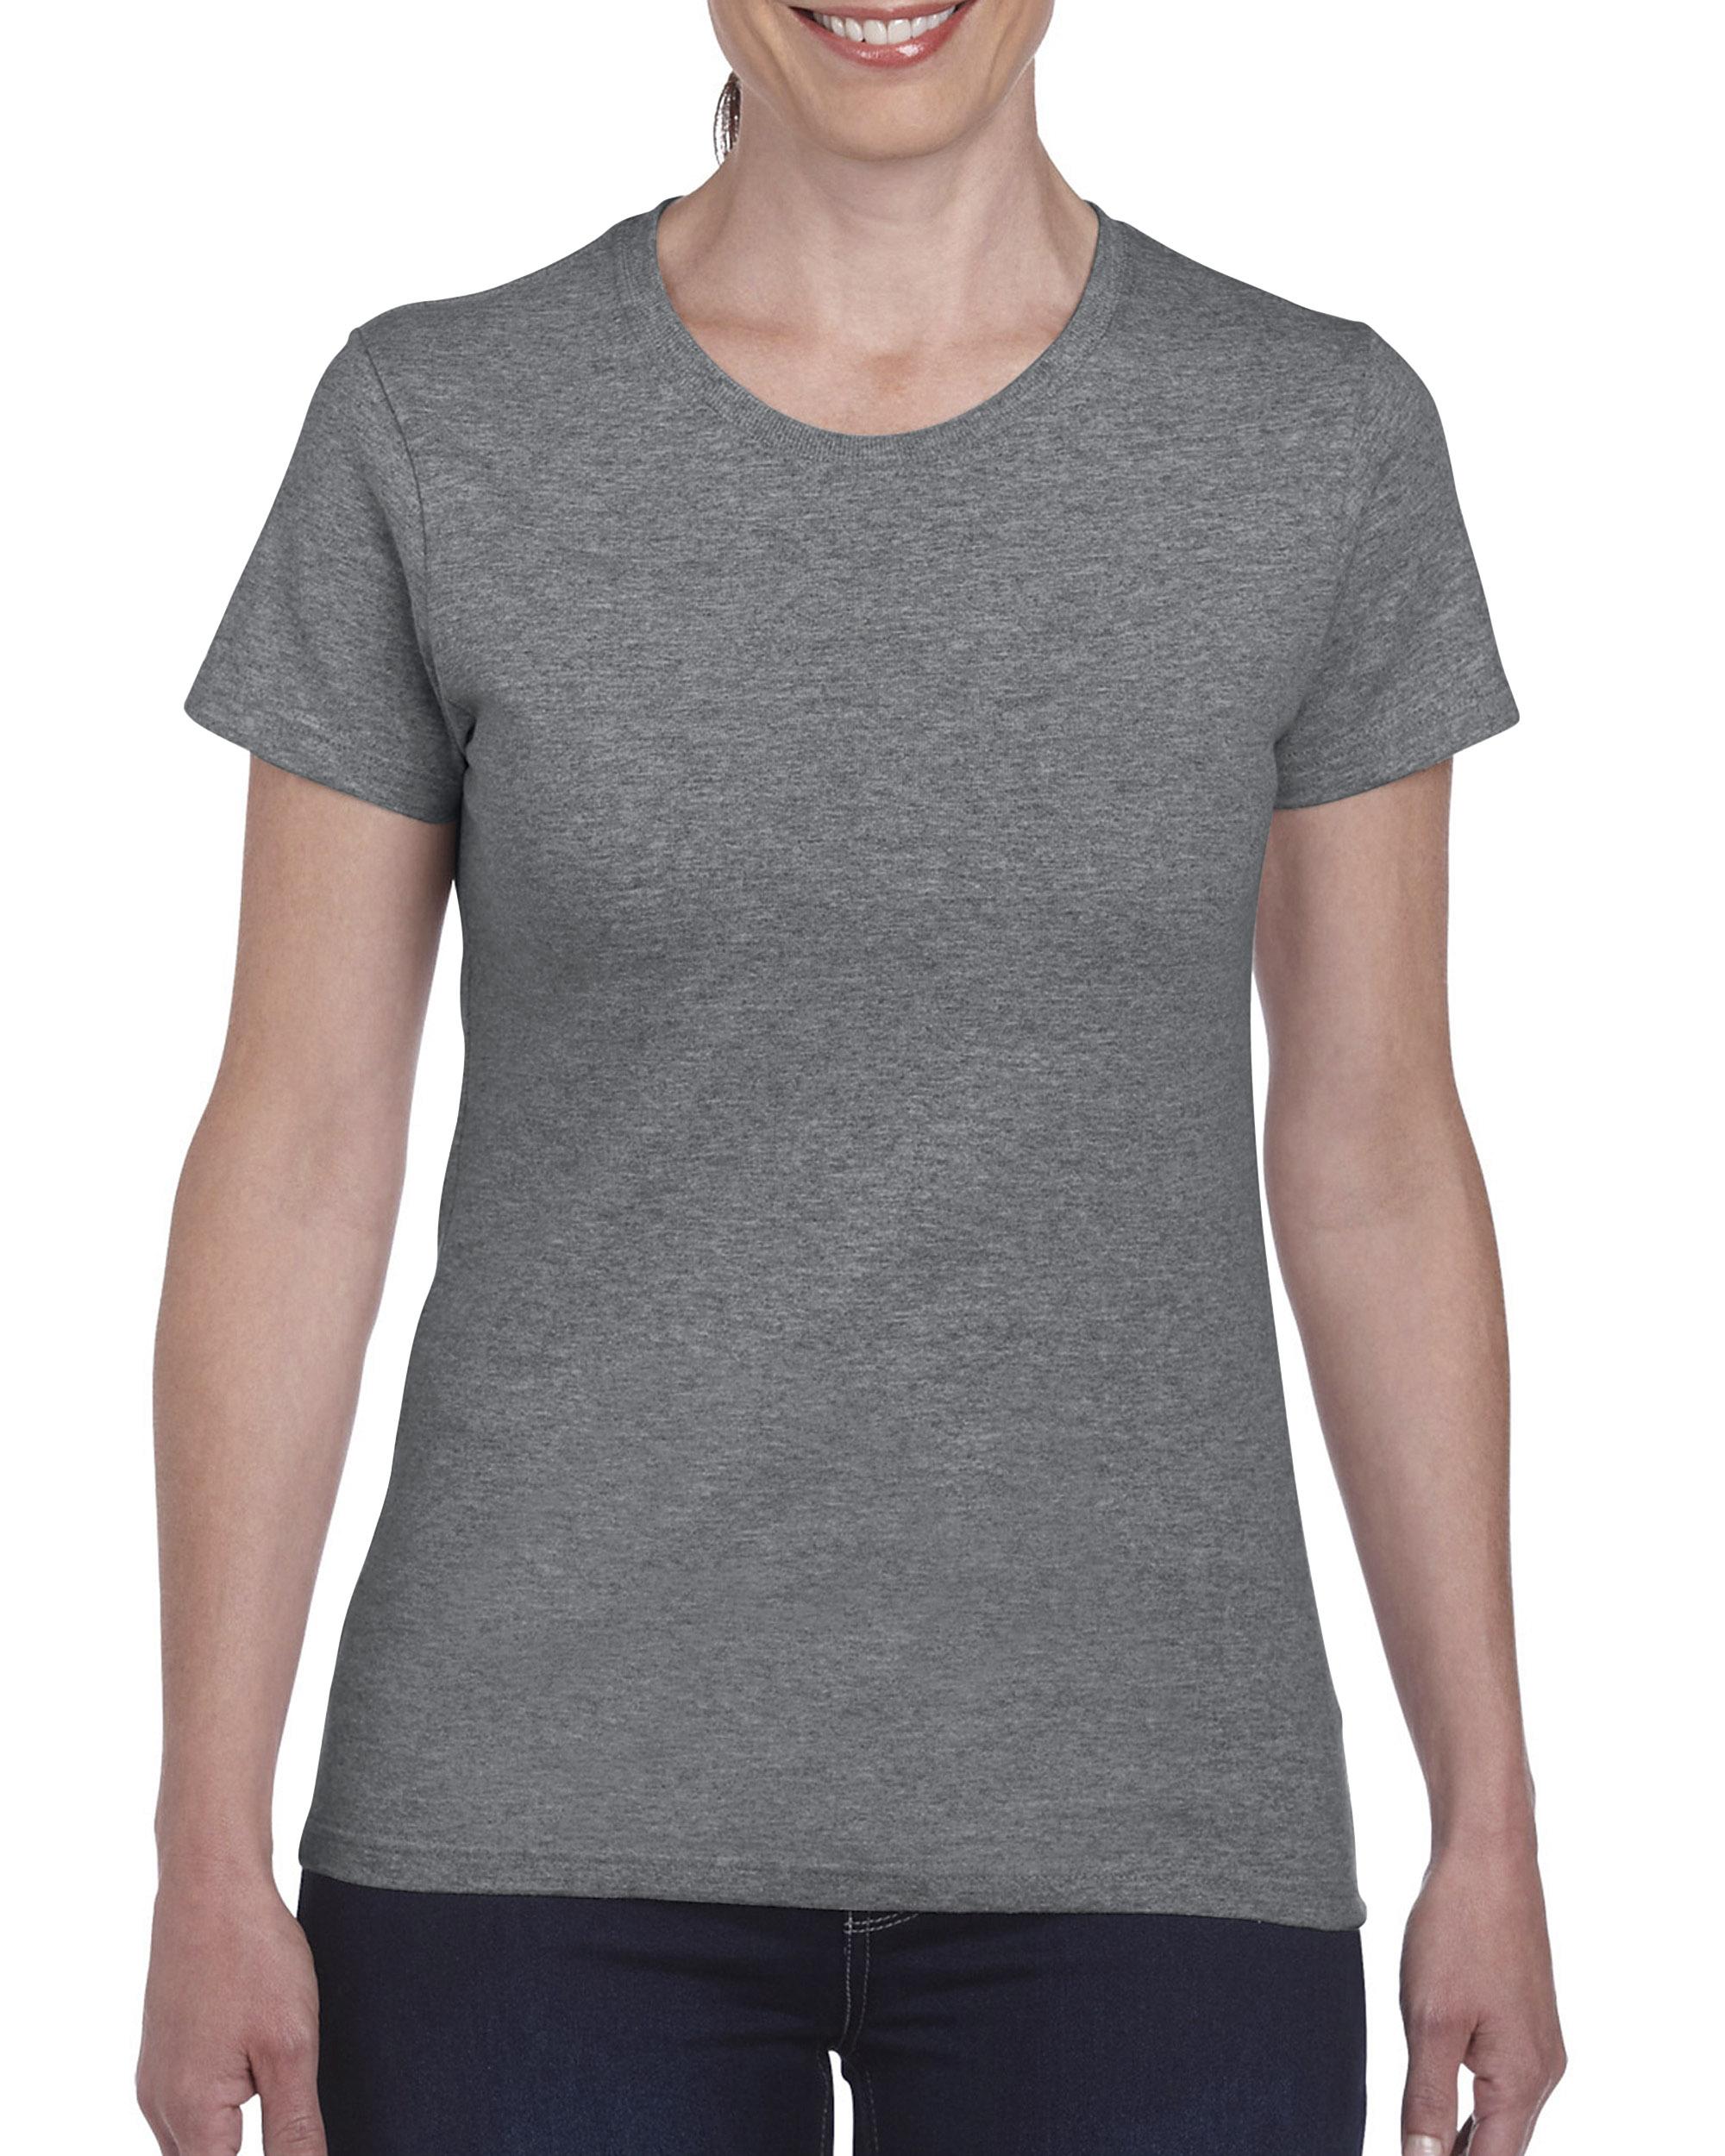 Gildan T-shirt Heavy Cotton for her